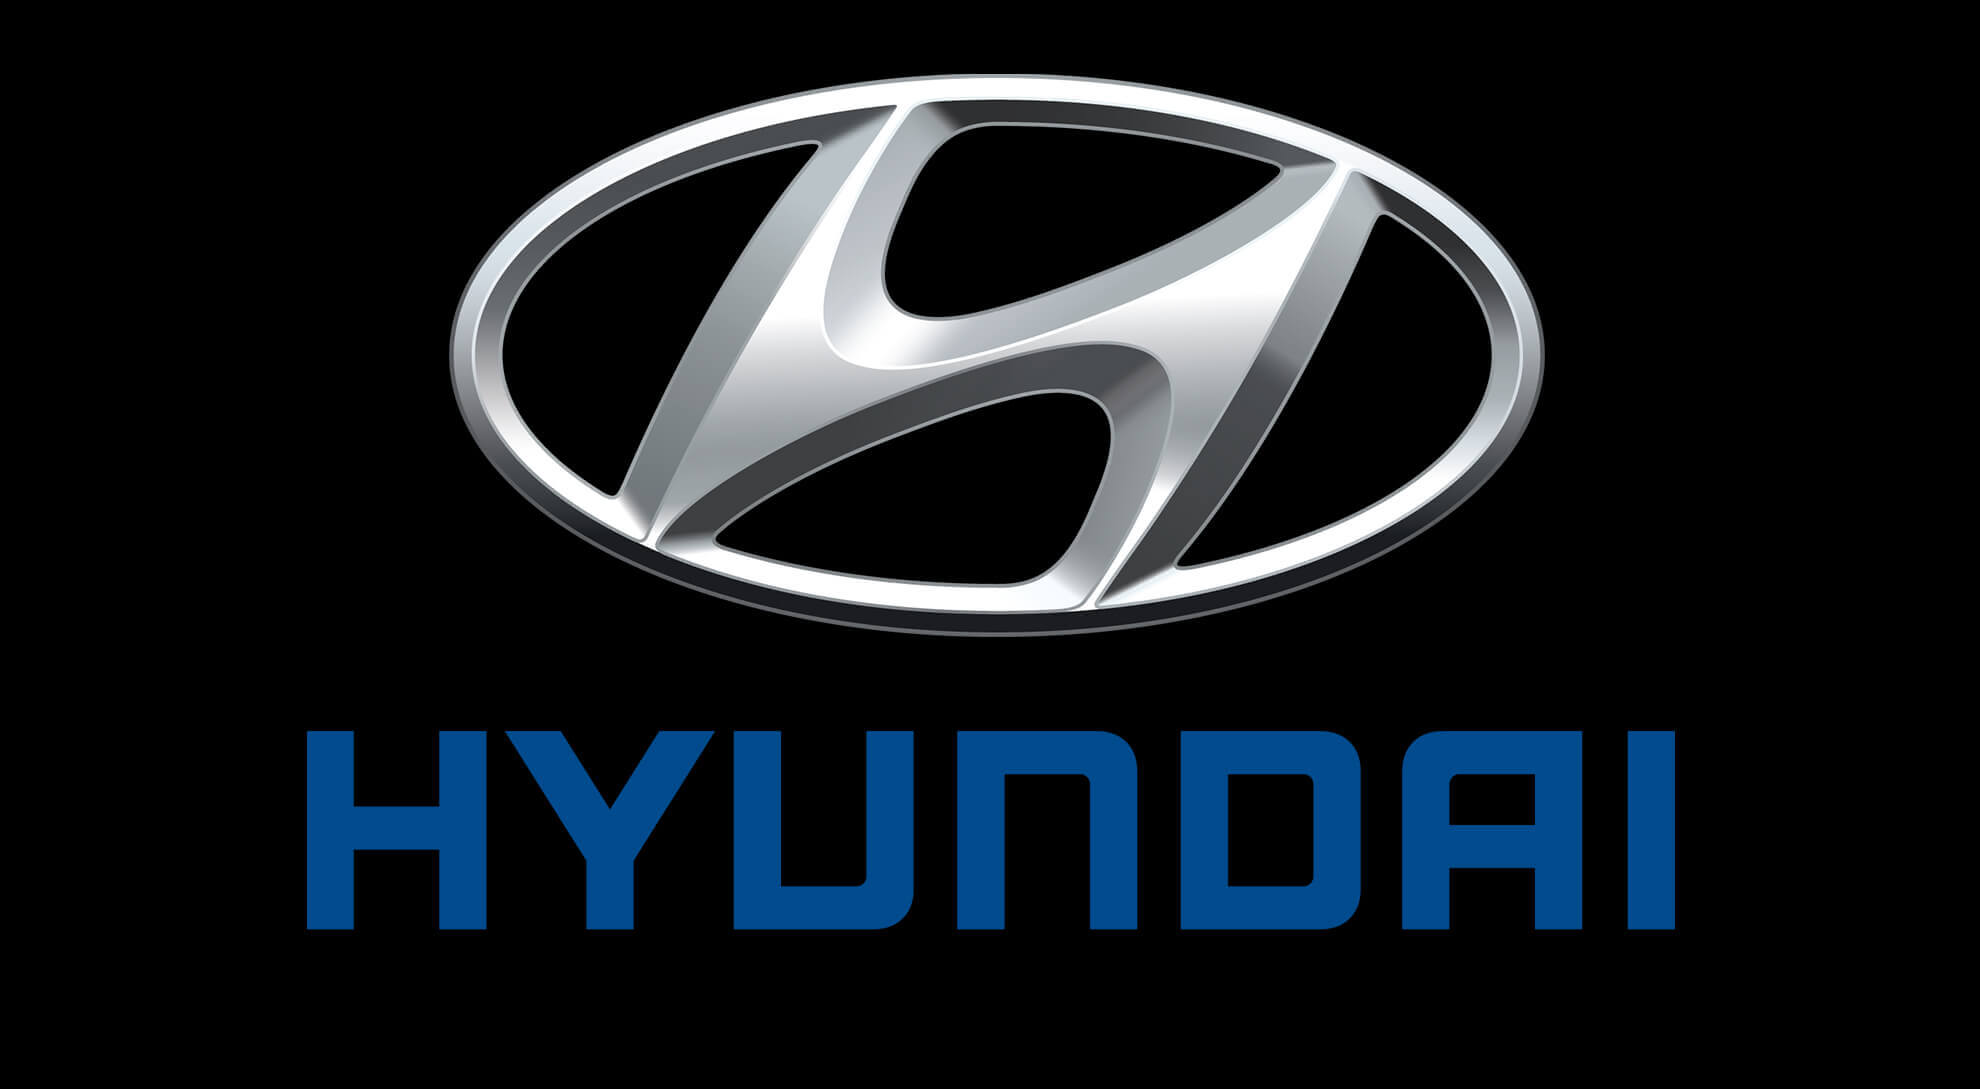 ustanovka-avtosignalizacii-hyundai